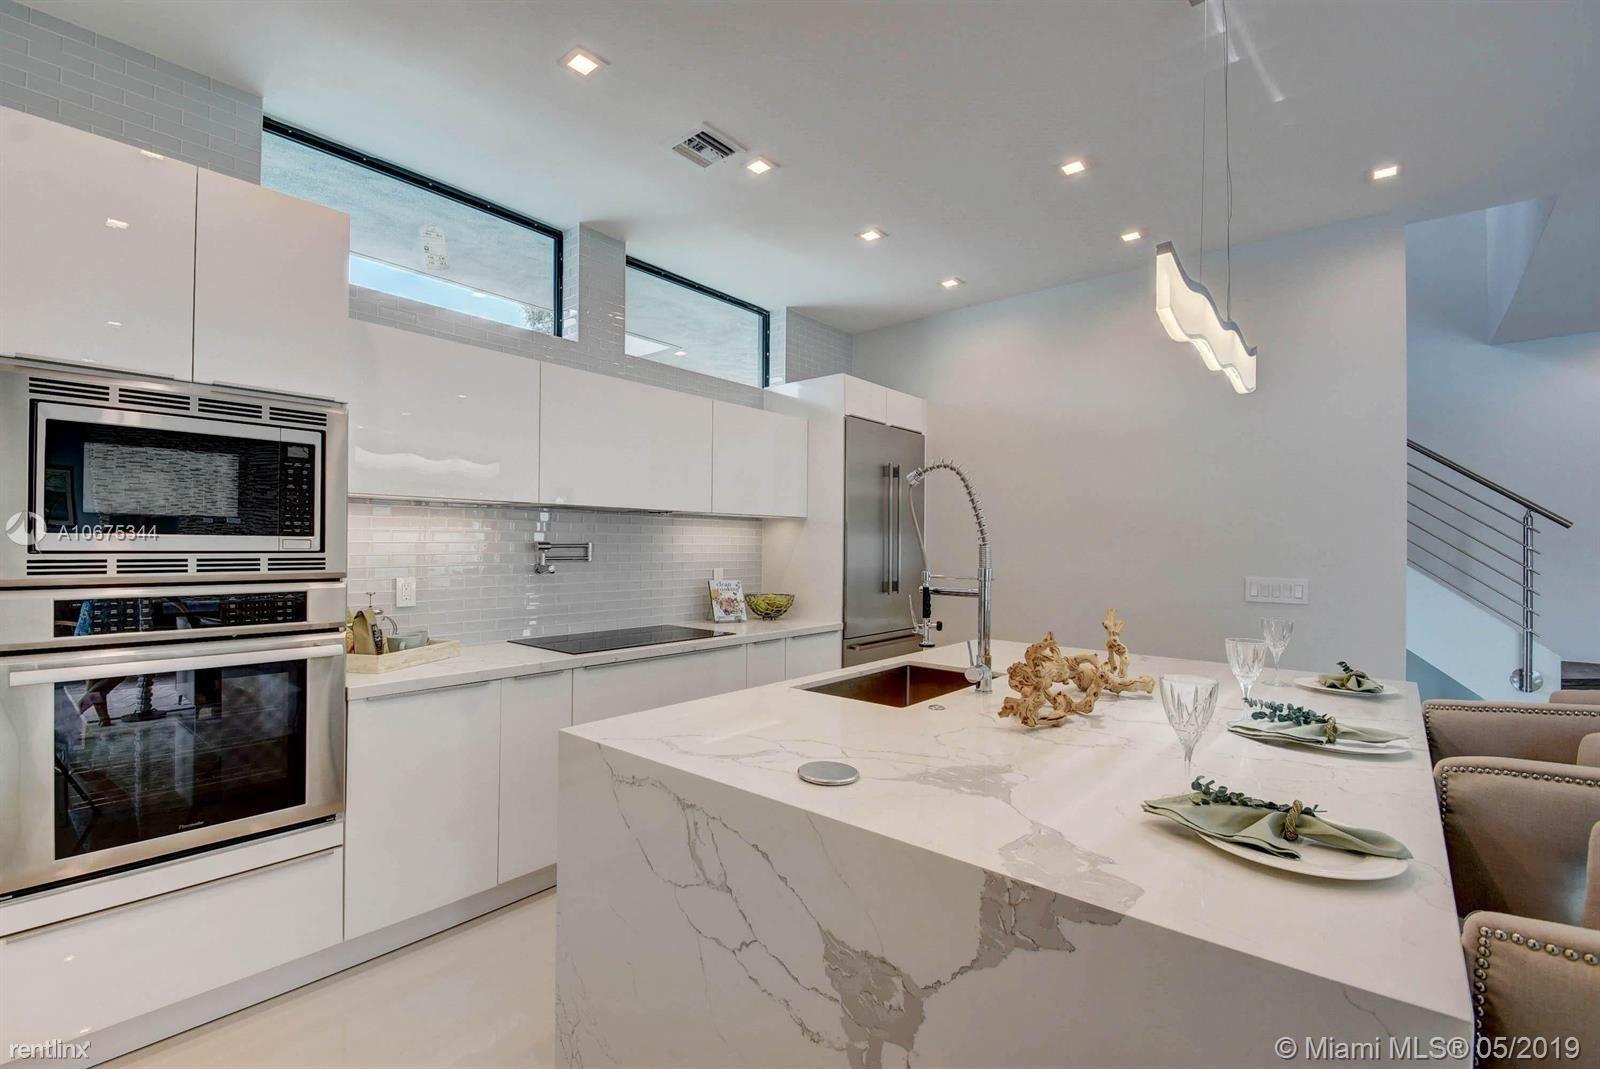 4201 Washington Rd for rent